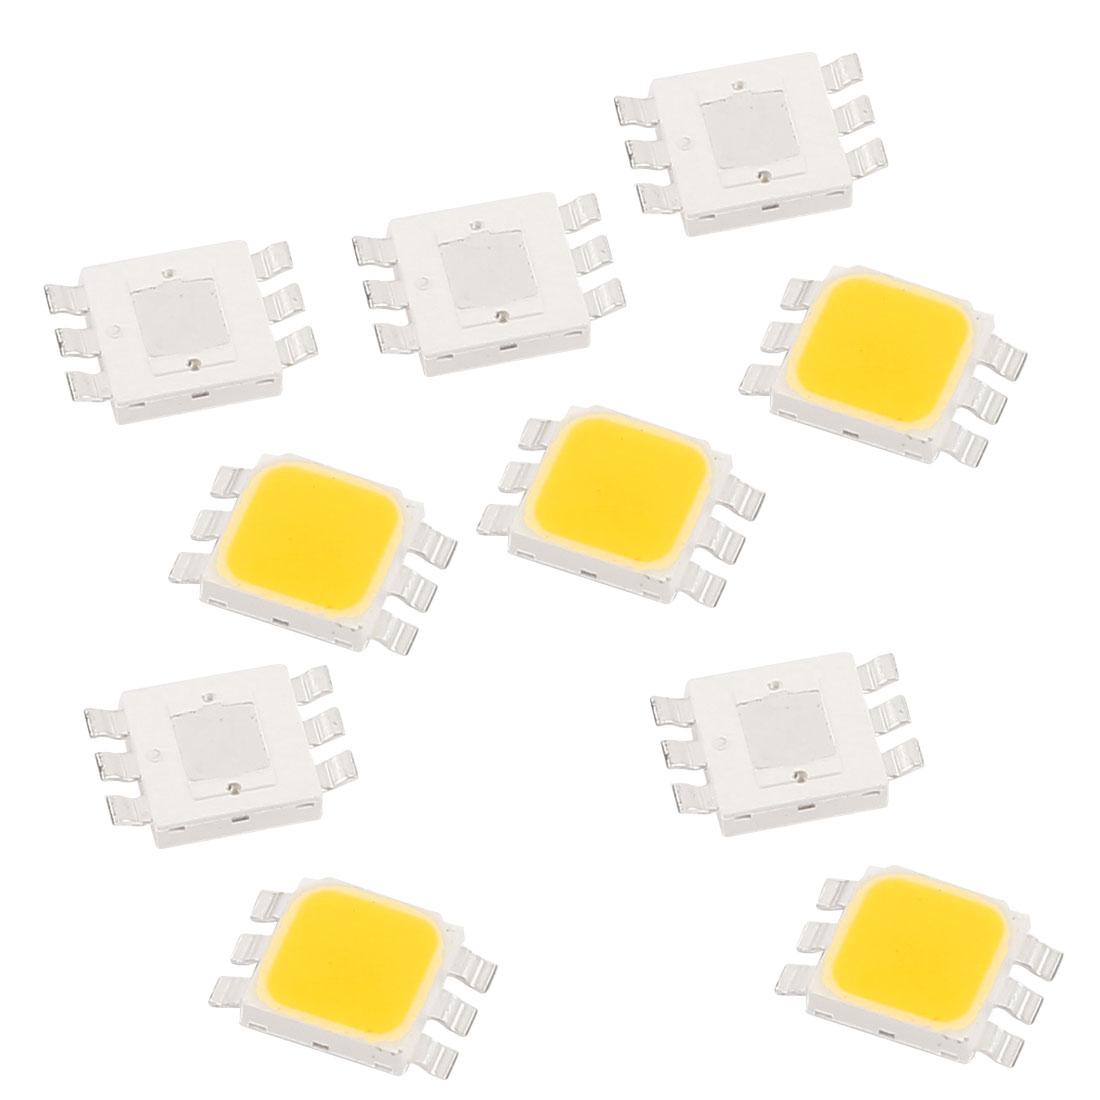 3.0-3.6V 350mA 1W Warm White High Power LED Bead SMD 5050 Chip Lamp Light 10pcs